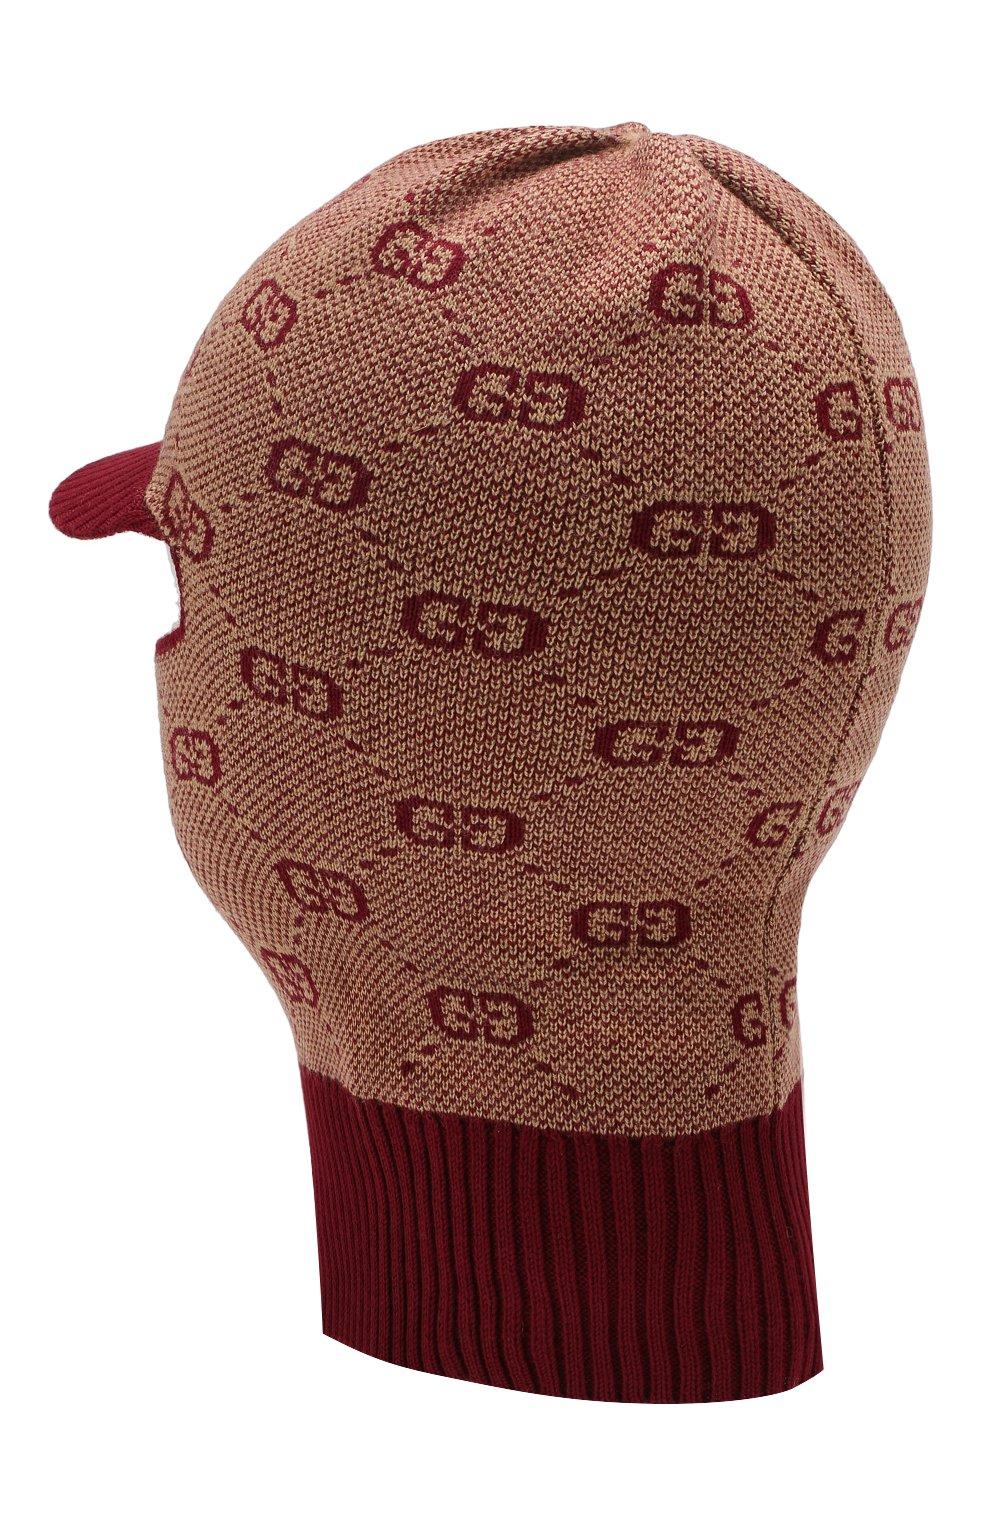 Детского шапка-балаклава из хлопка и шерсти GUCCI бордового цвета, арт. 574721/4K208   Фото 2